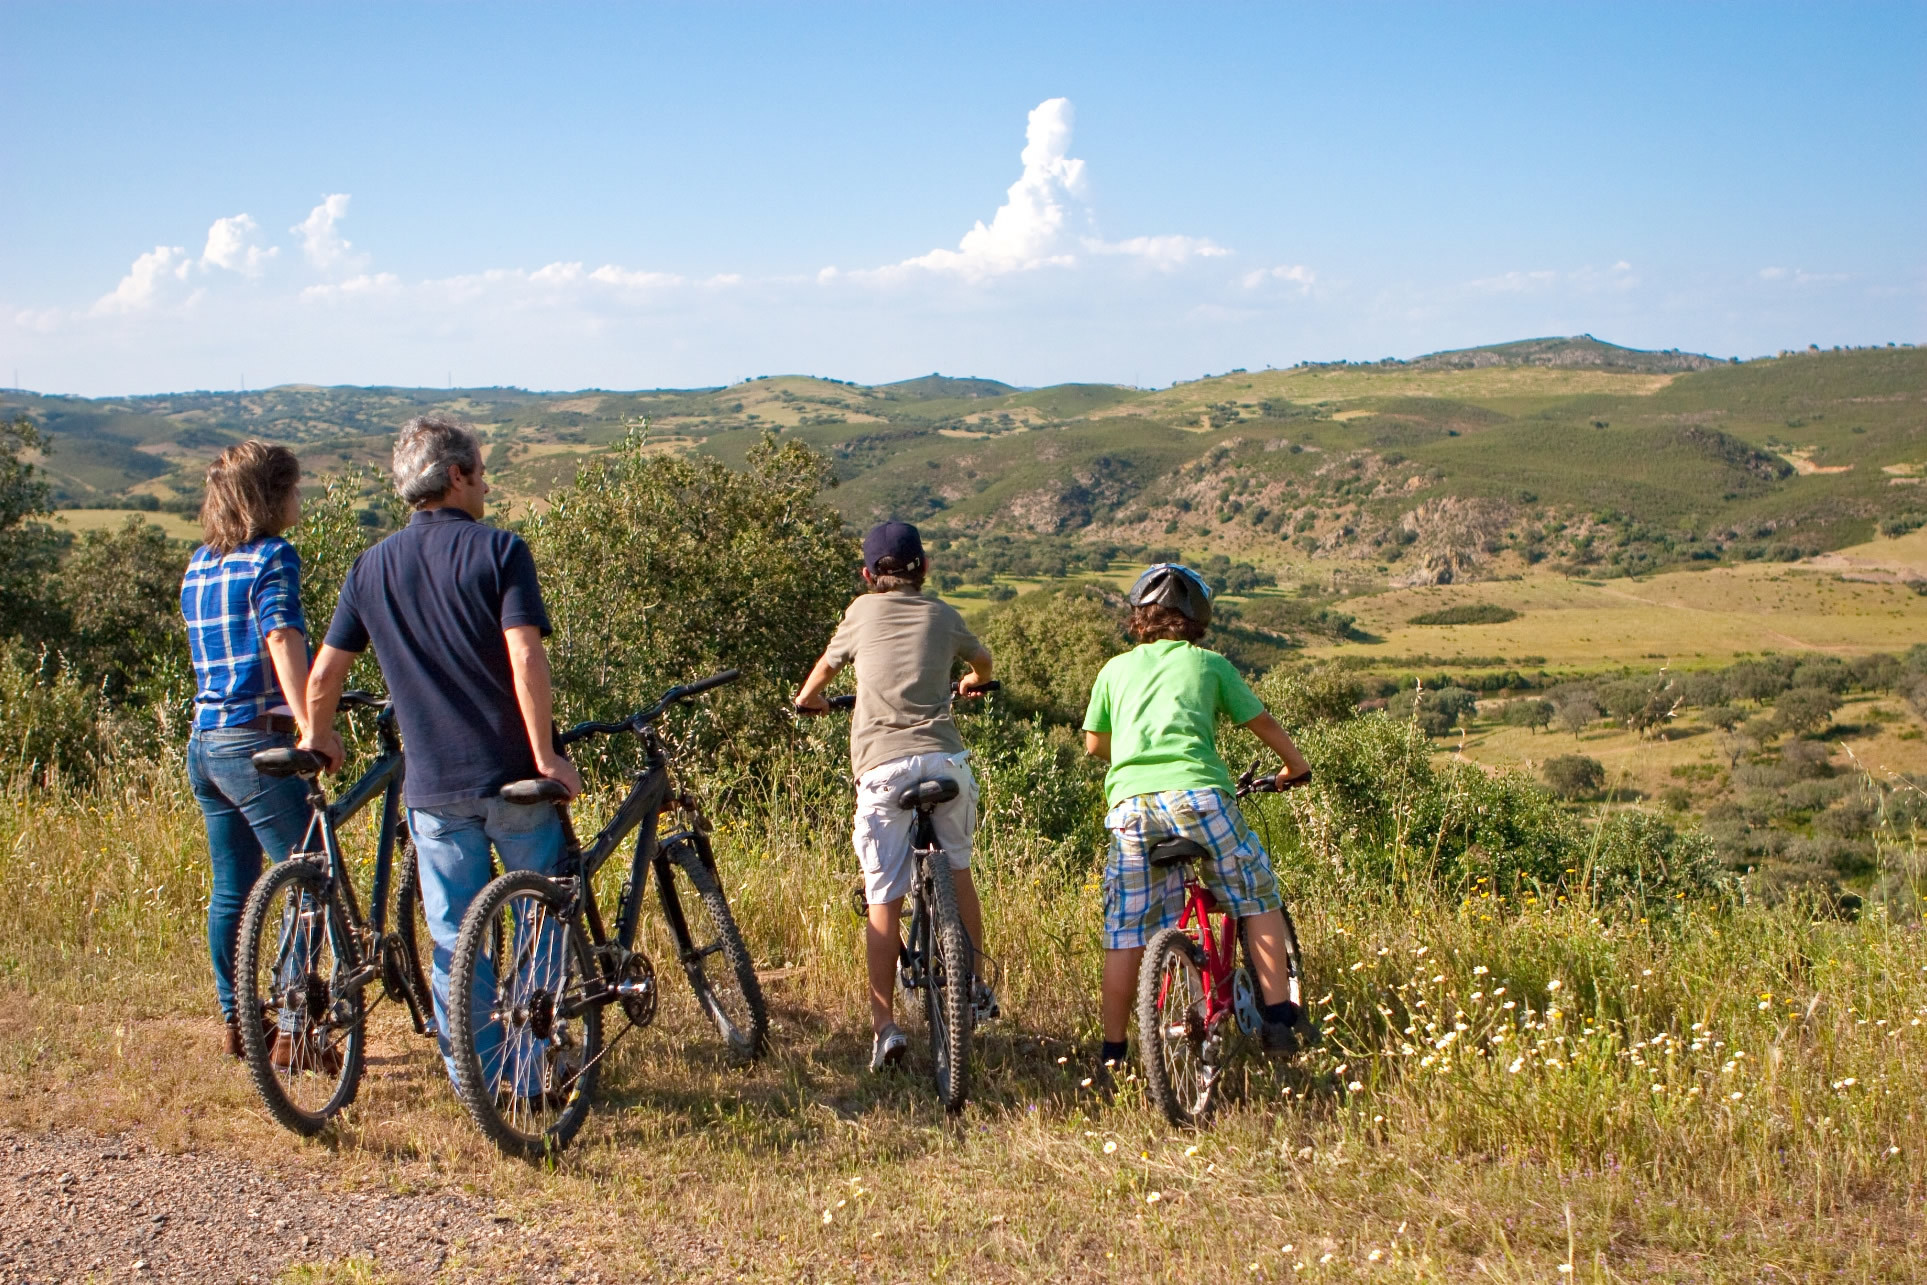 De_bicicleta_em_Noudar_PNN_EDIA.jpg